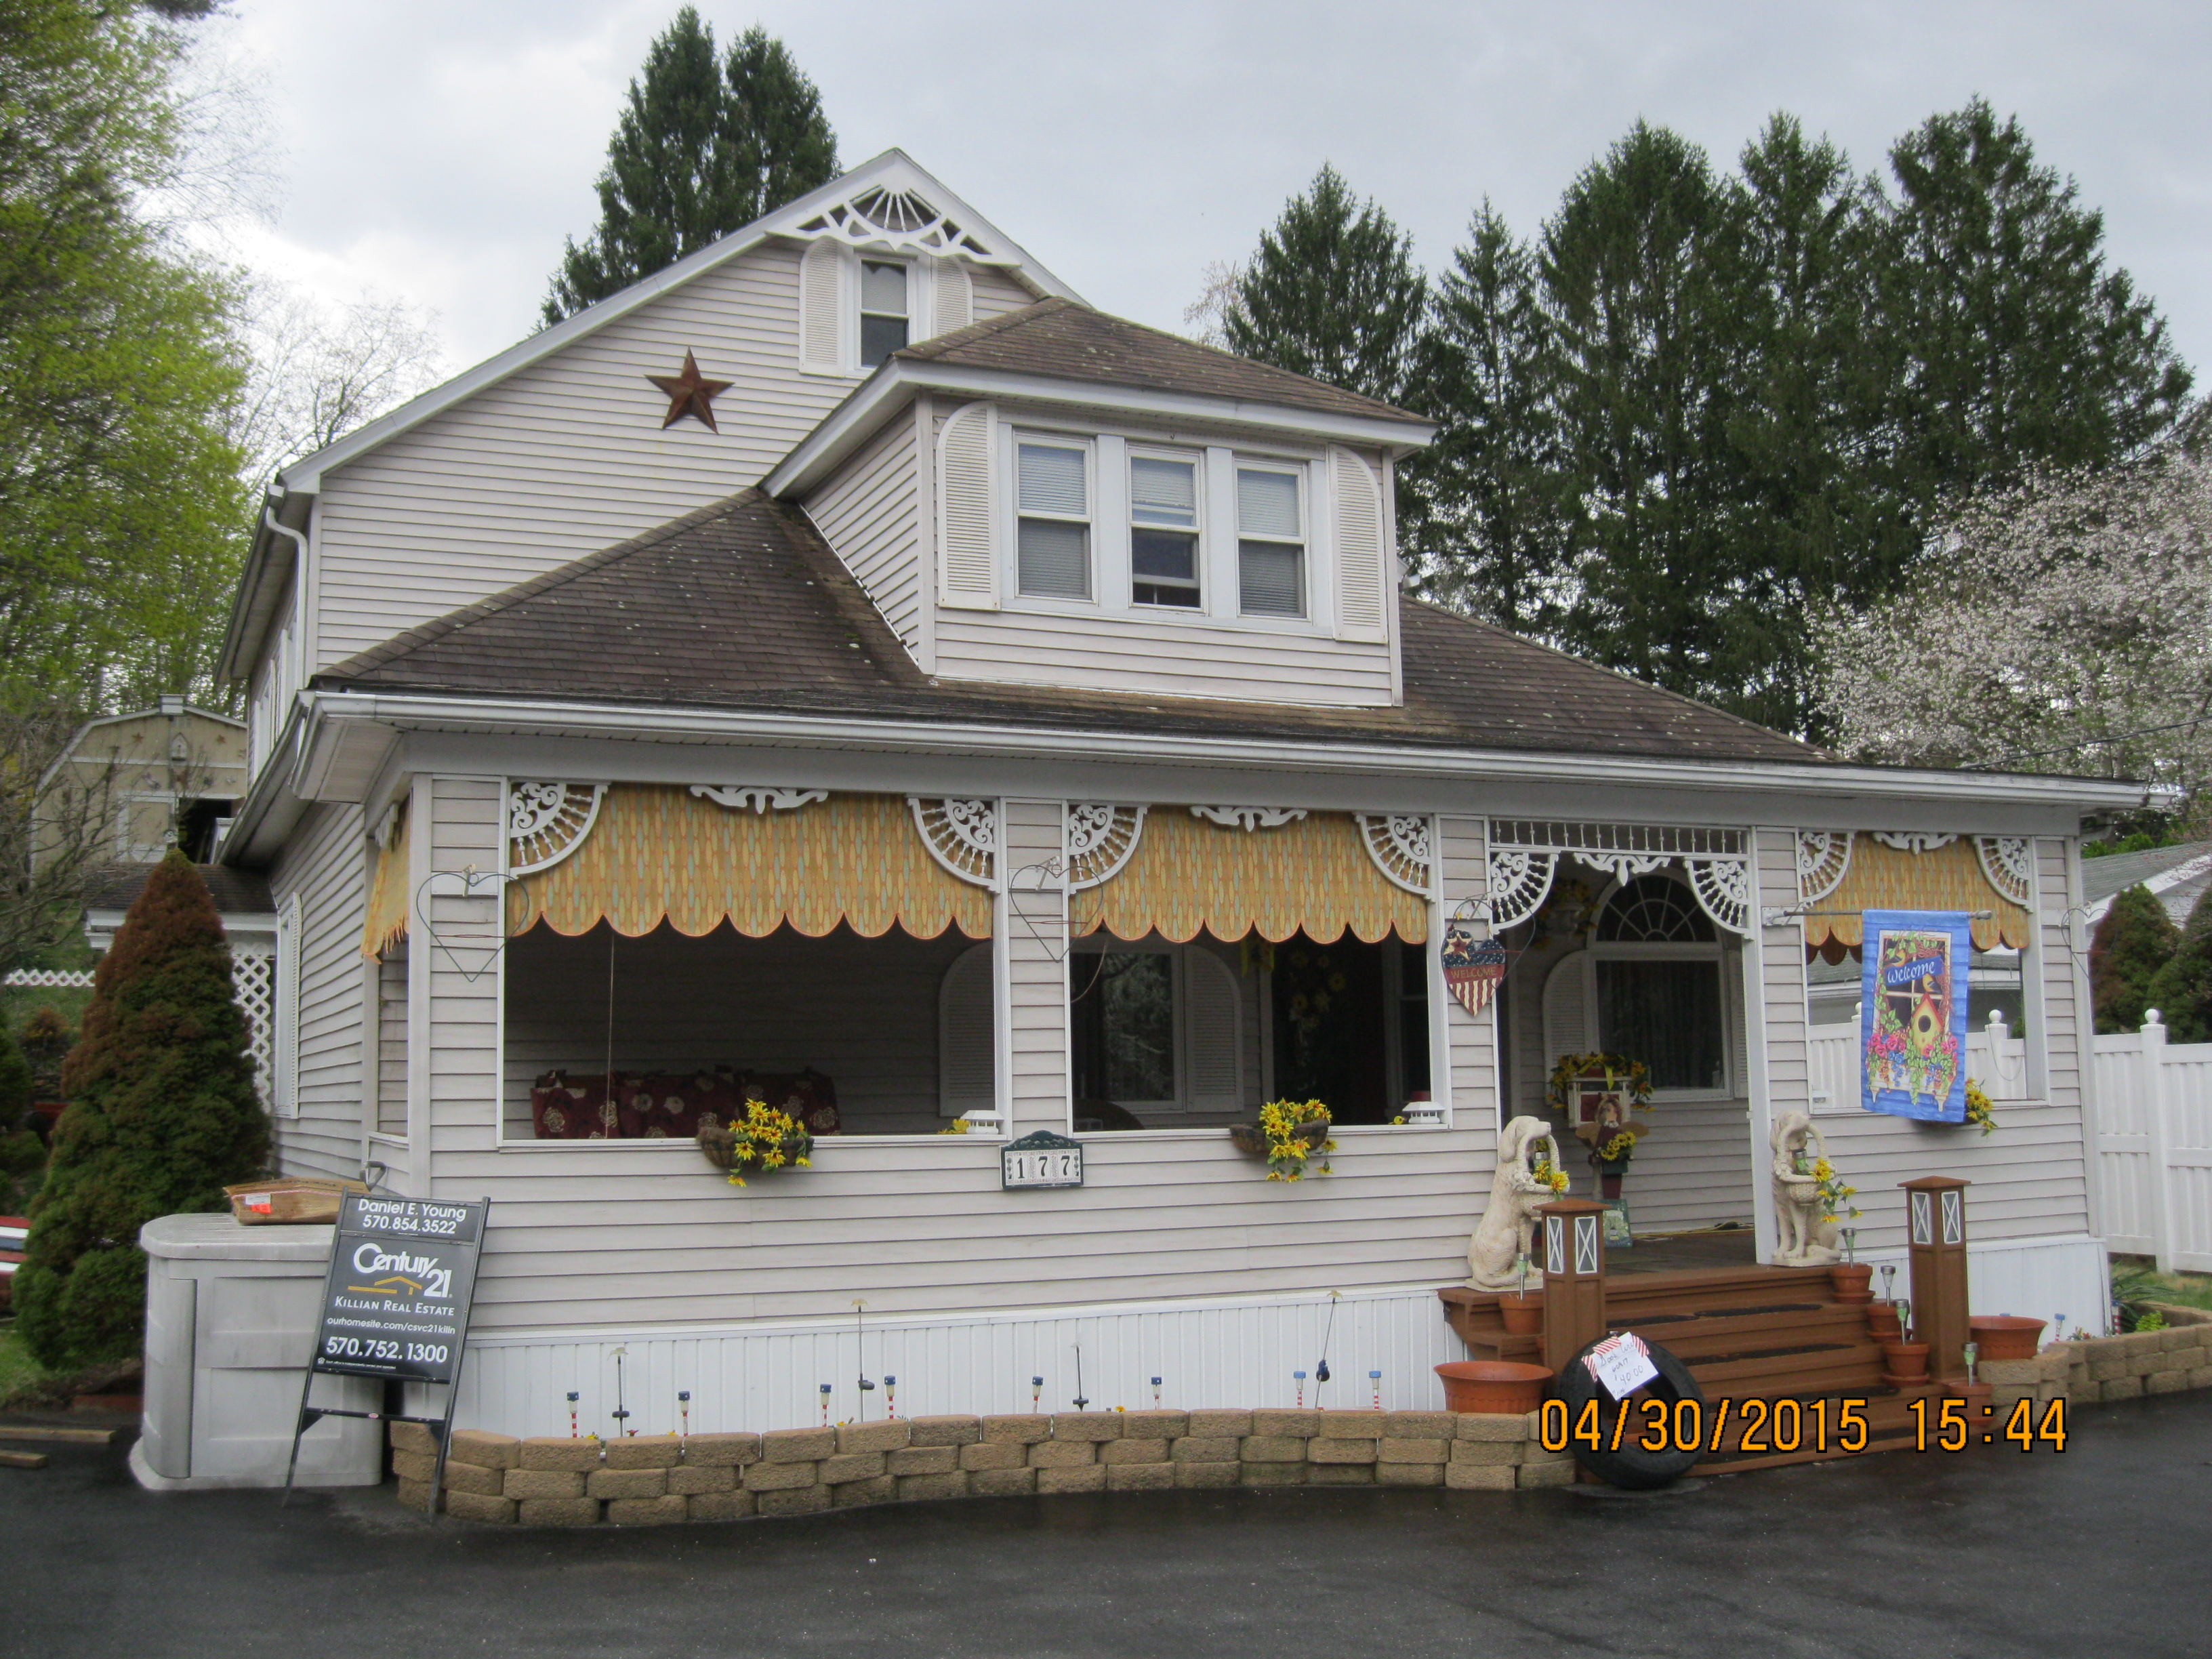 177 Main St, Monanaqua, Pennsylvania 18655